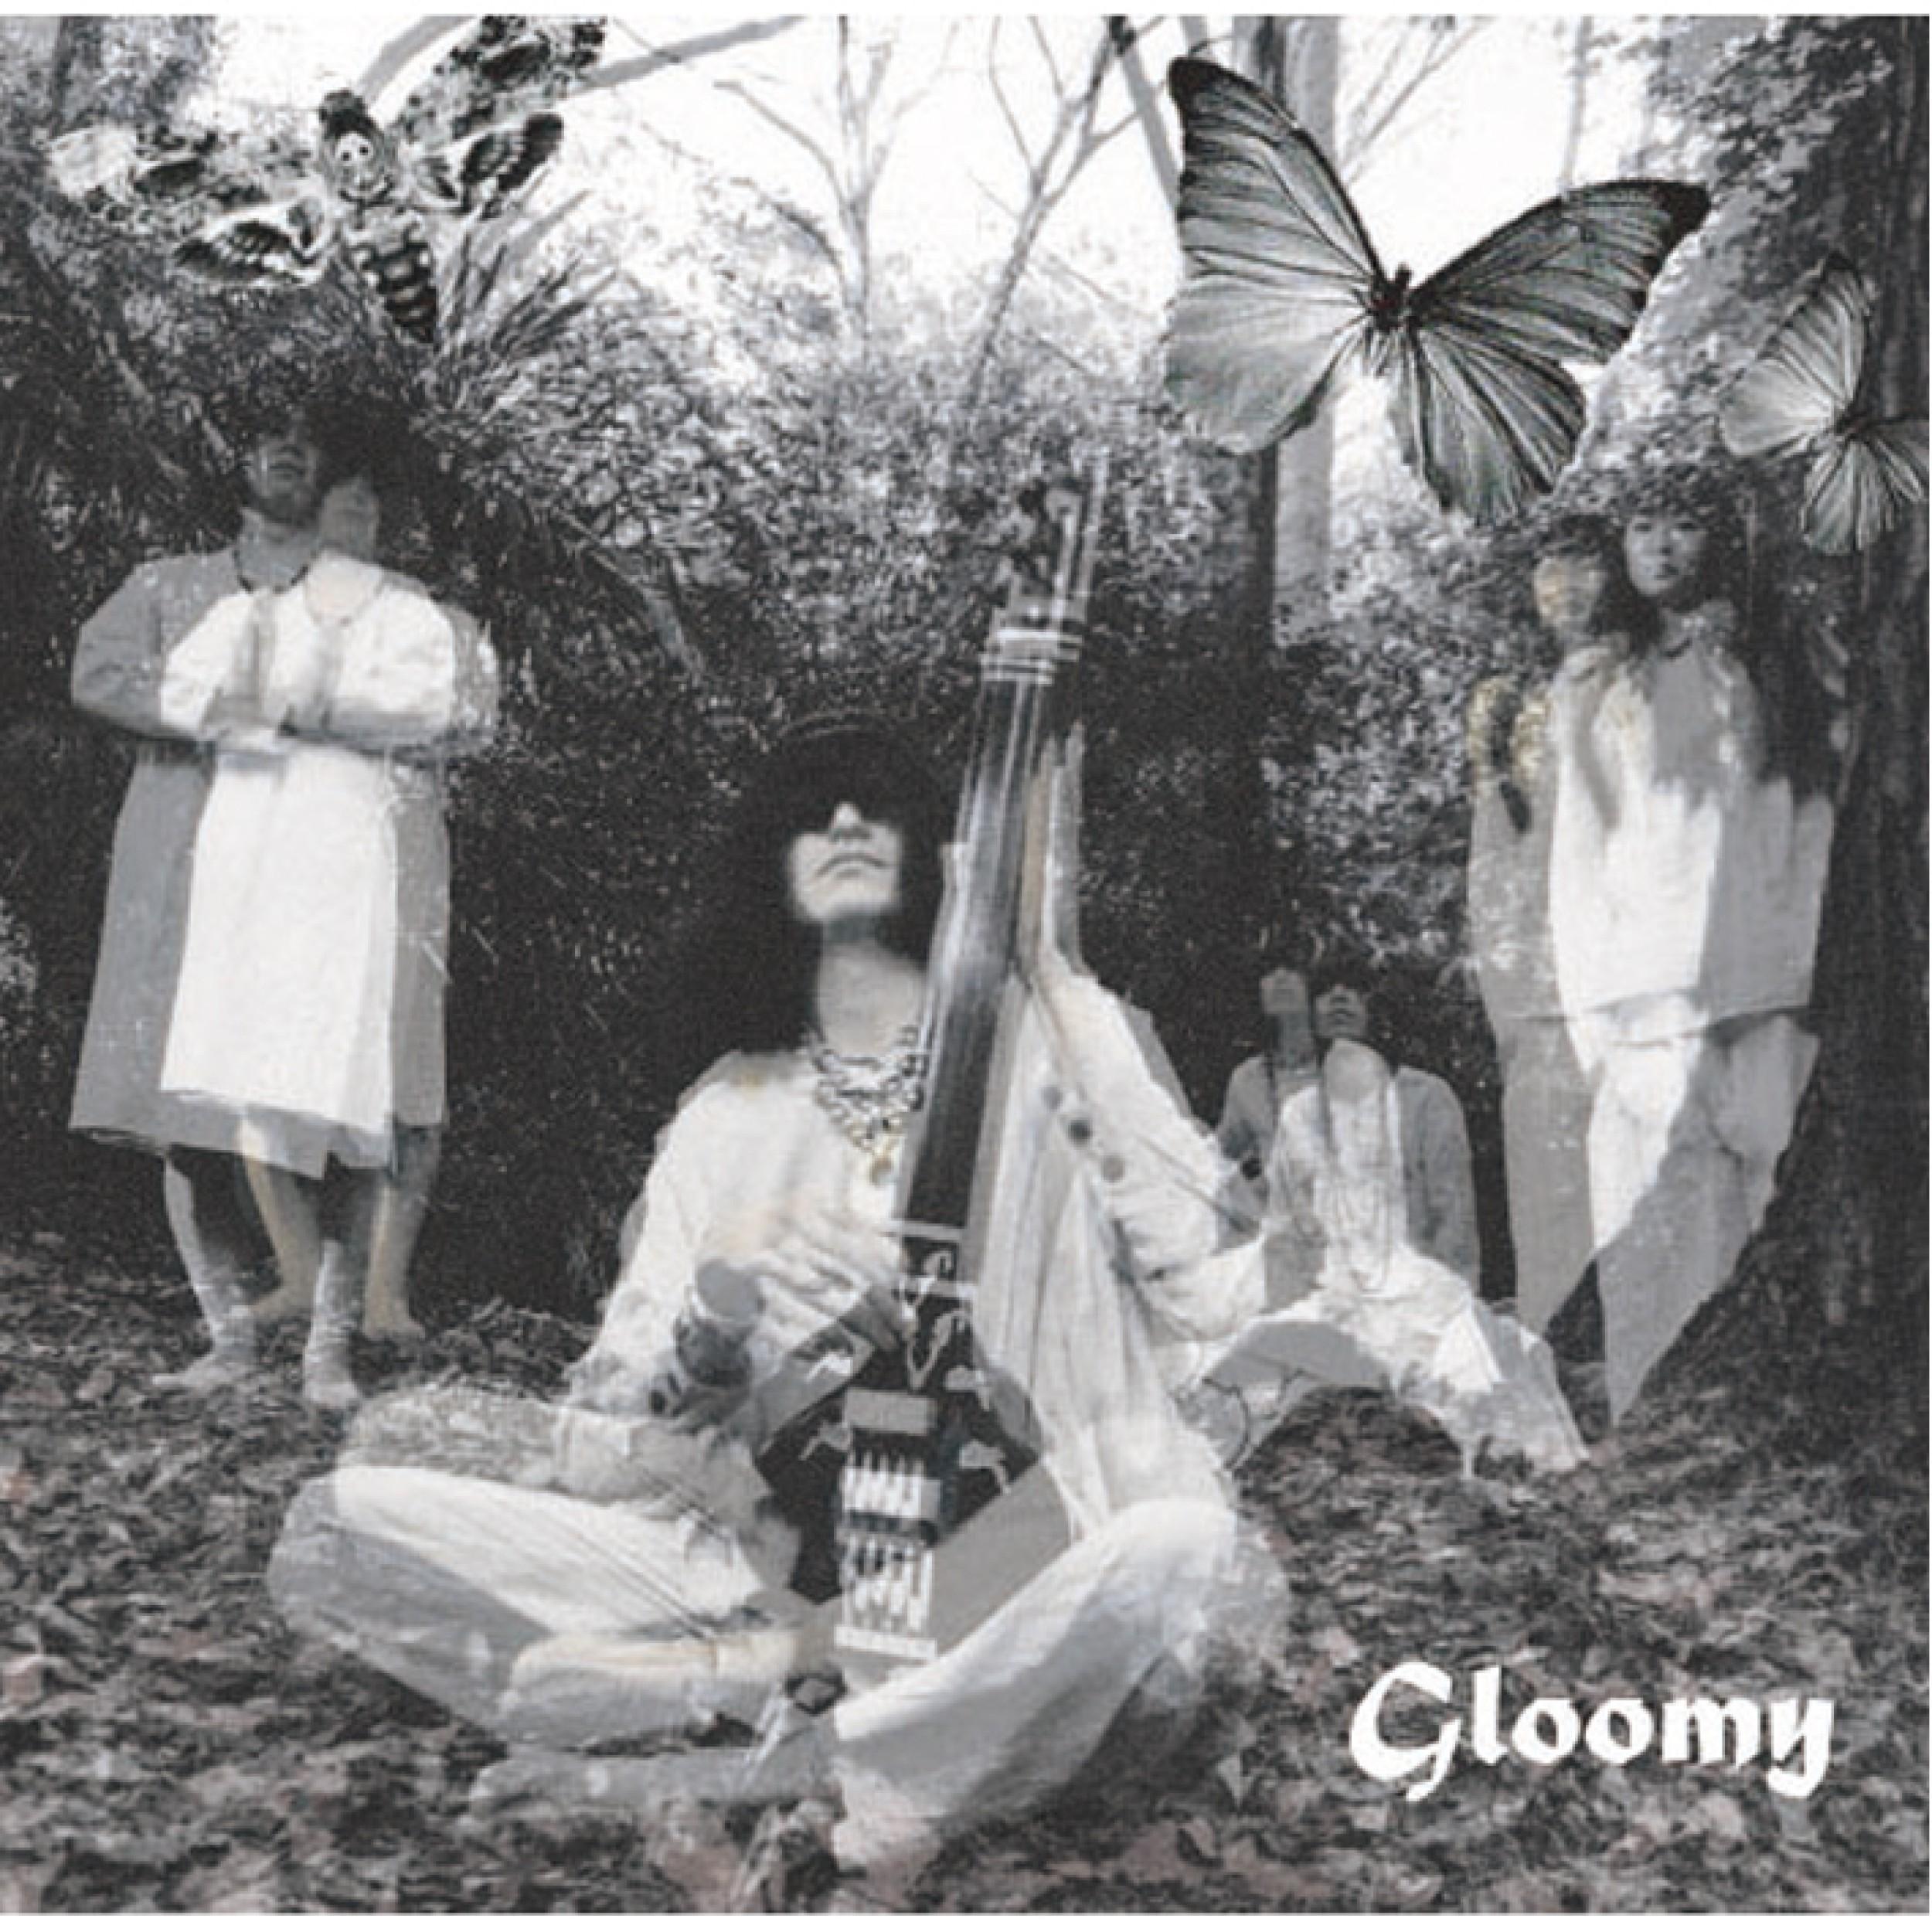 Image of Gloomy / 毛皮のマリーズ